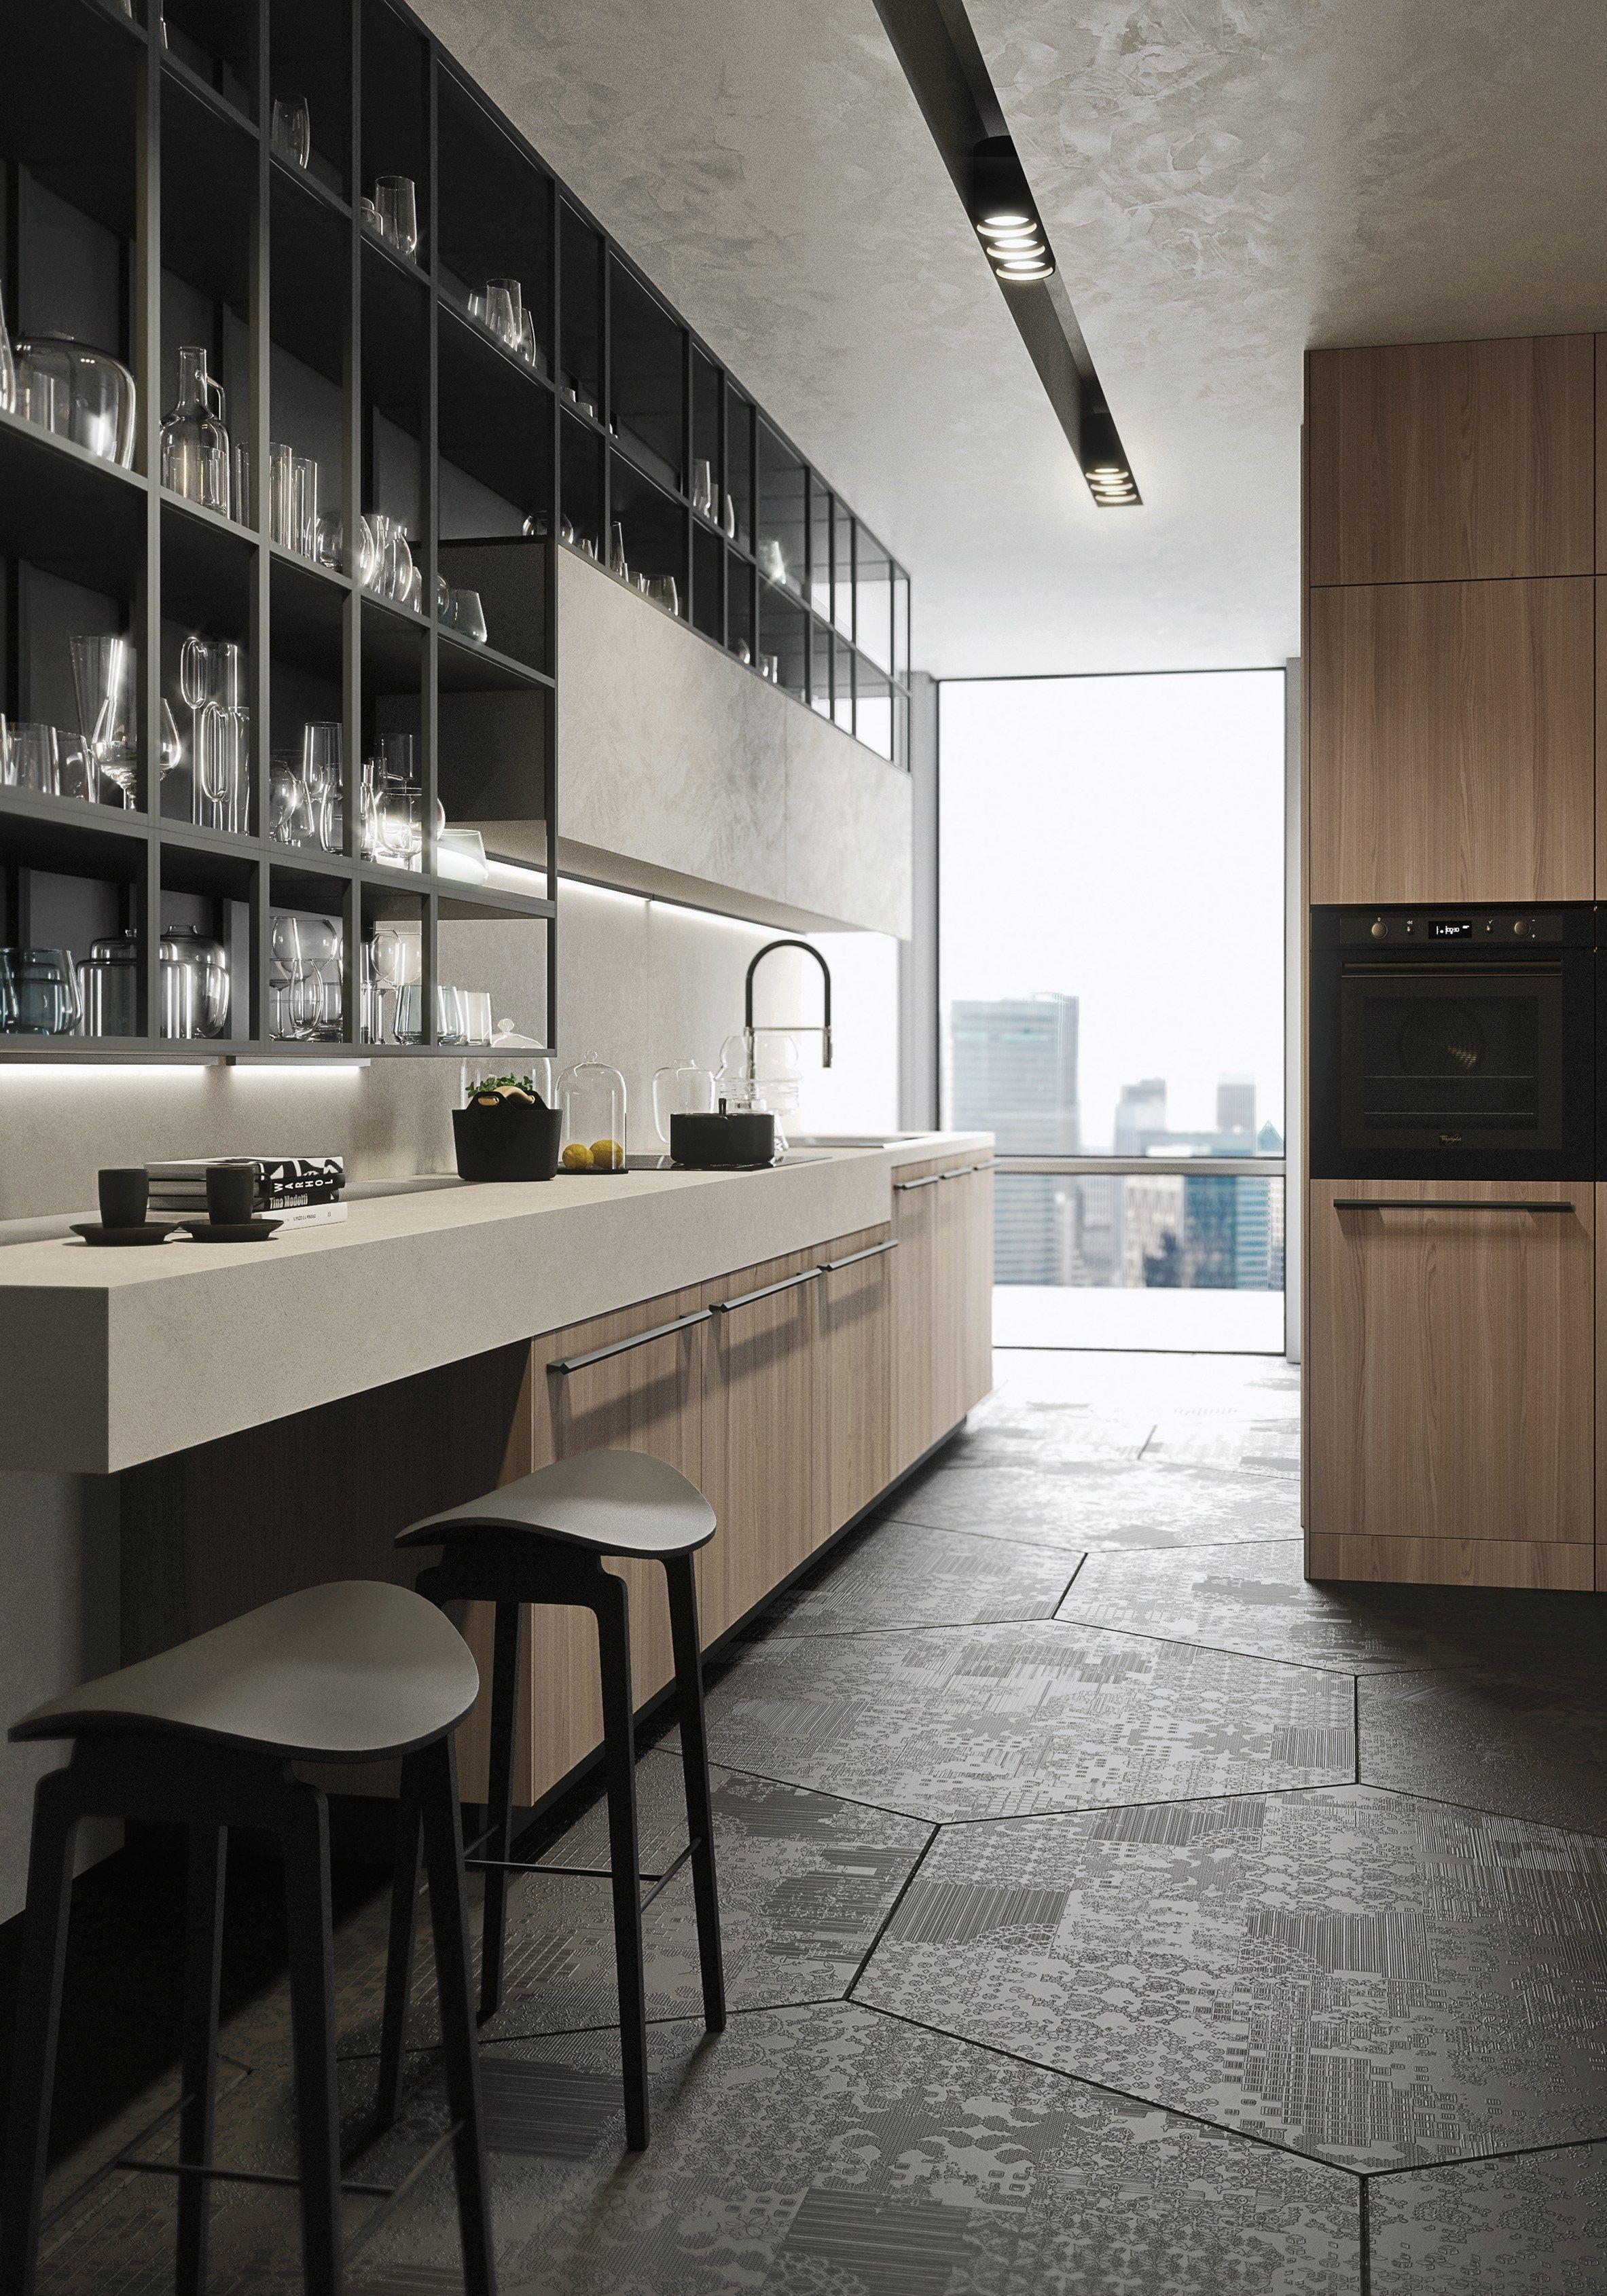 OPERA Cuisine linéaire by Snaidero design Michele Marcon | CUISINE ...